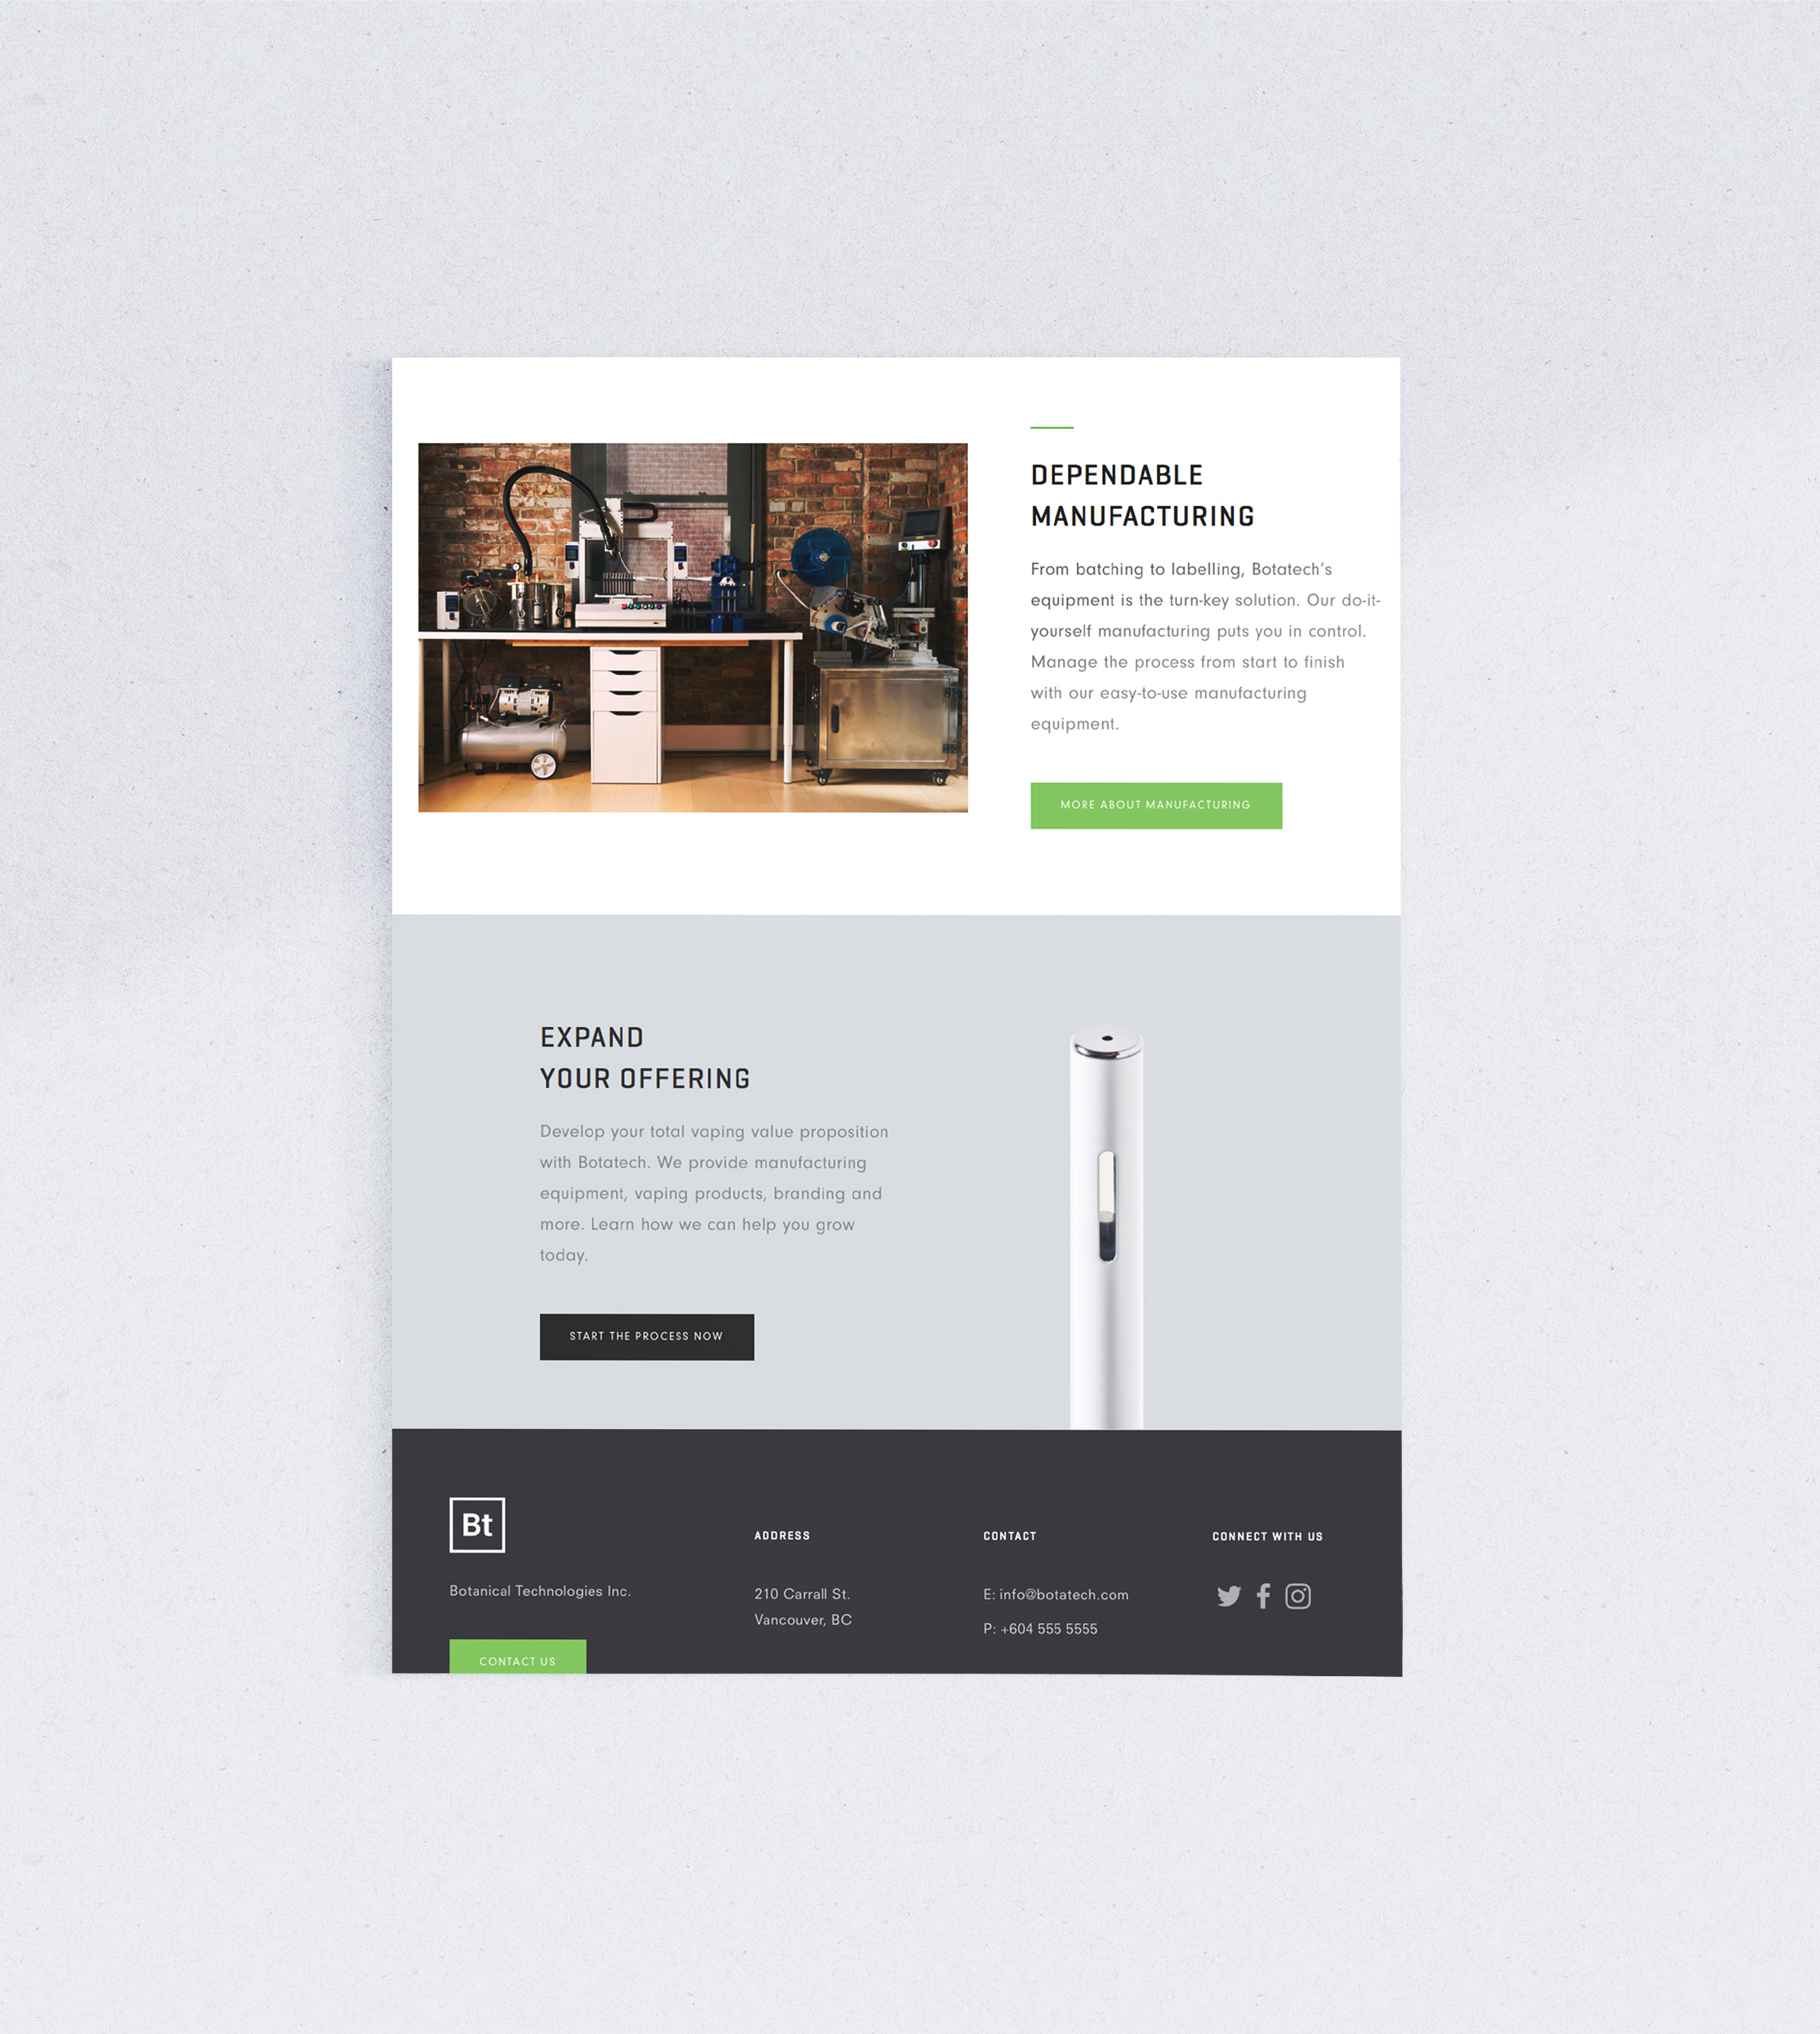 Siblings Creative Design Studio Botatech Homepage Offering